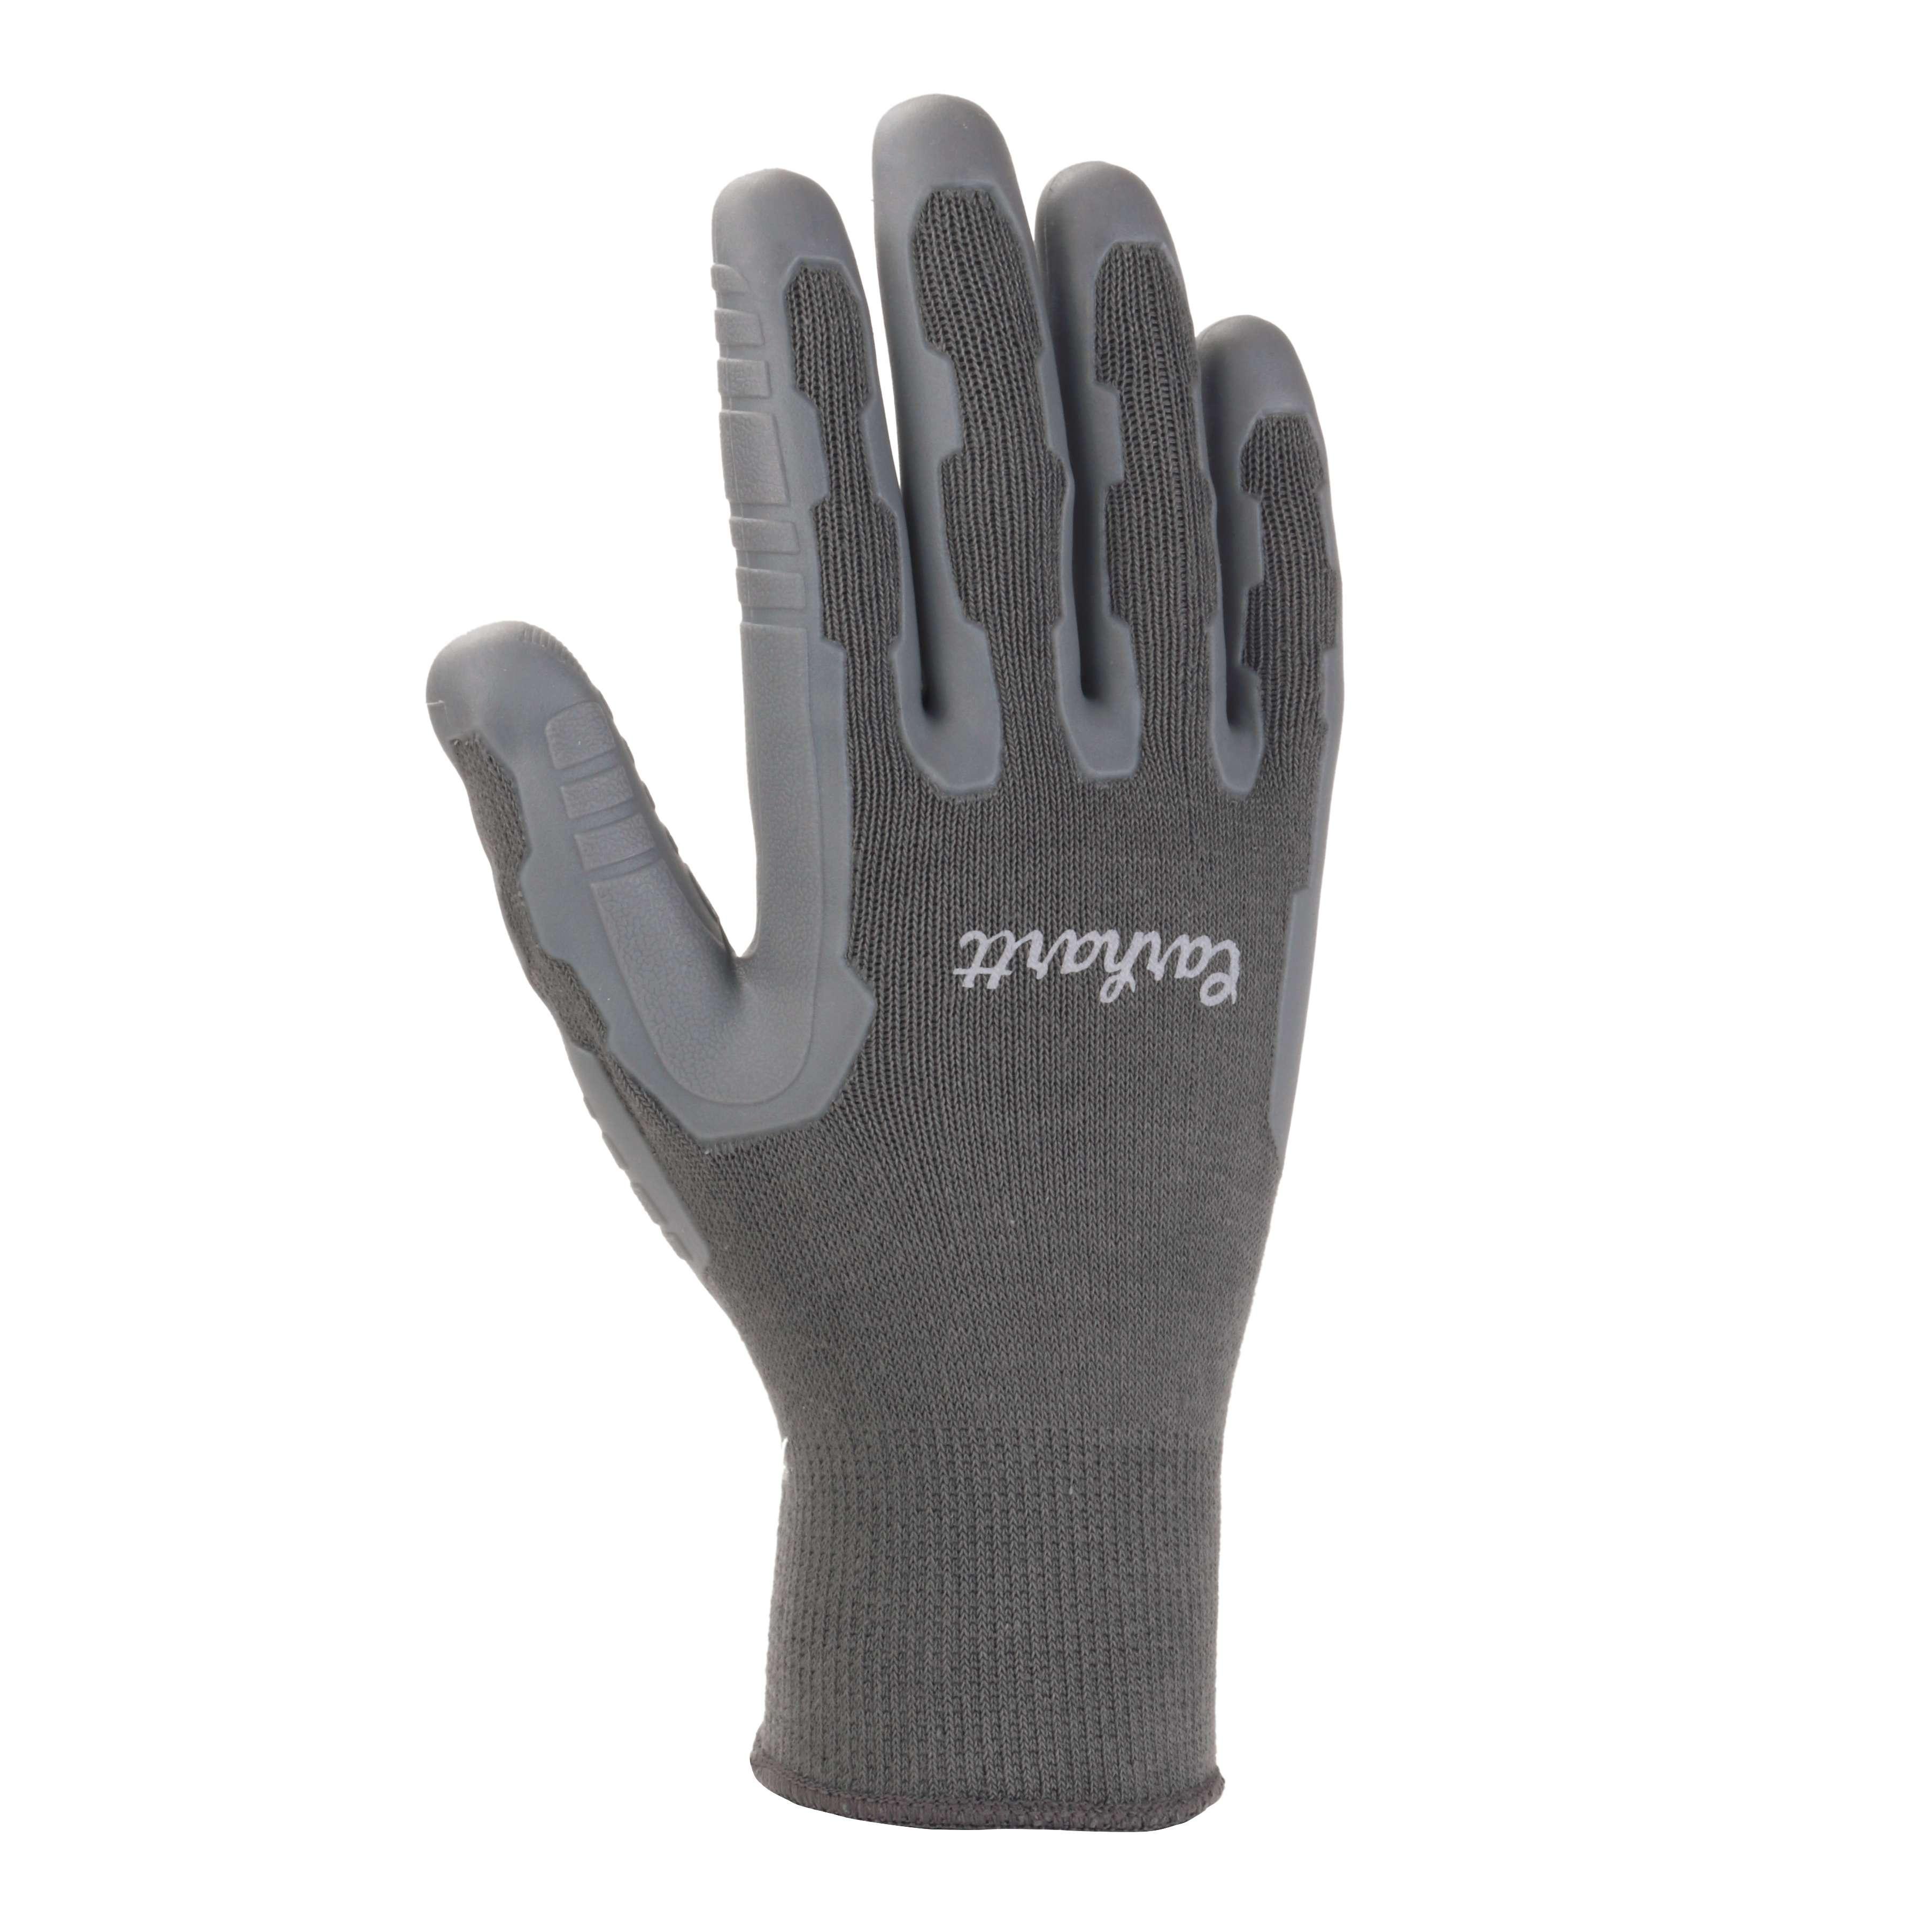 Carhartt Women's C-Grip Pro Palm Glove